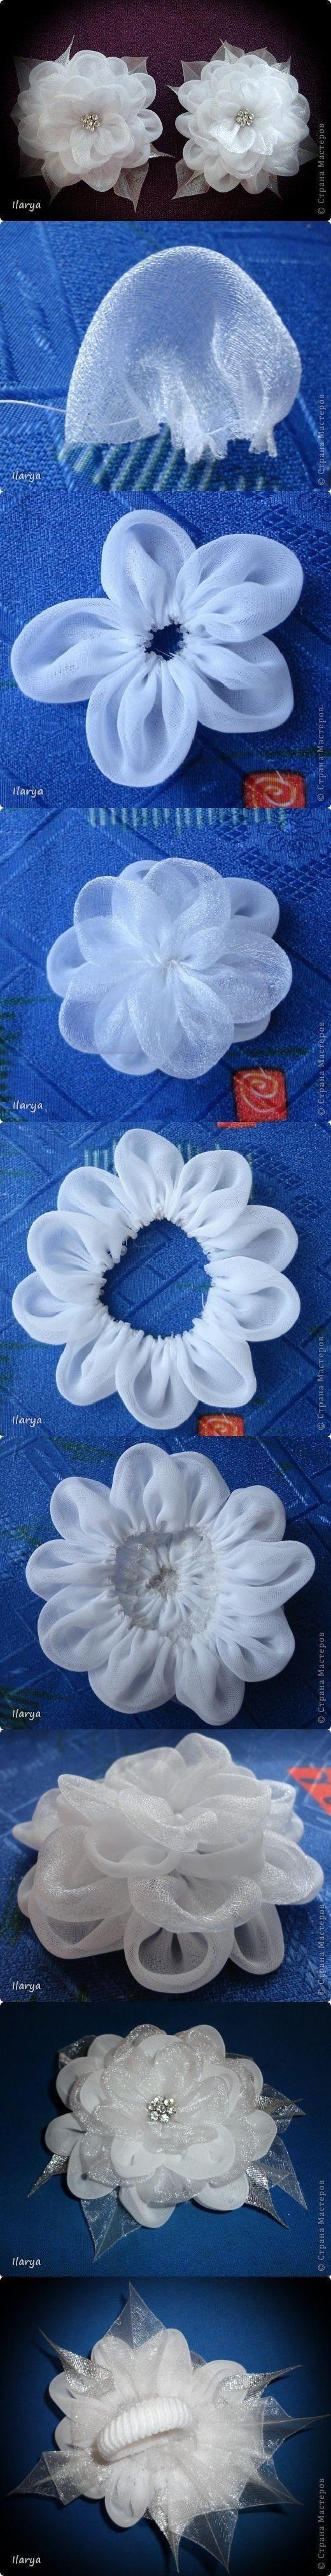 diy fabric flower lust #flower